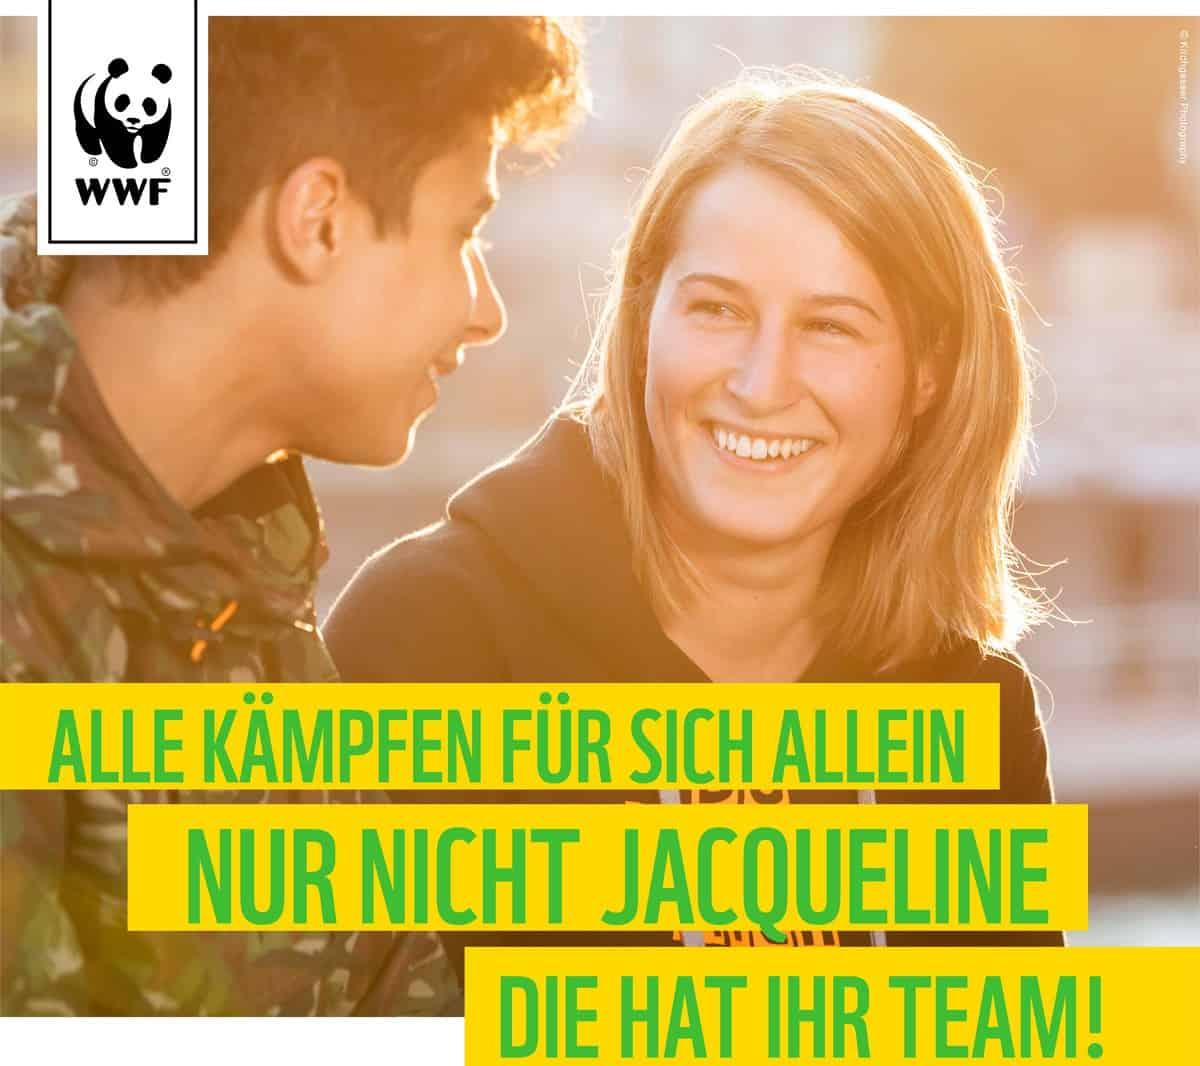 WWF Jacqueline Hintergrundbild 3